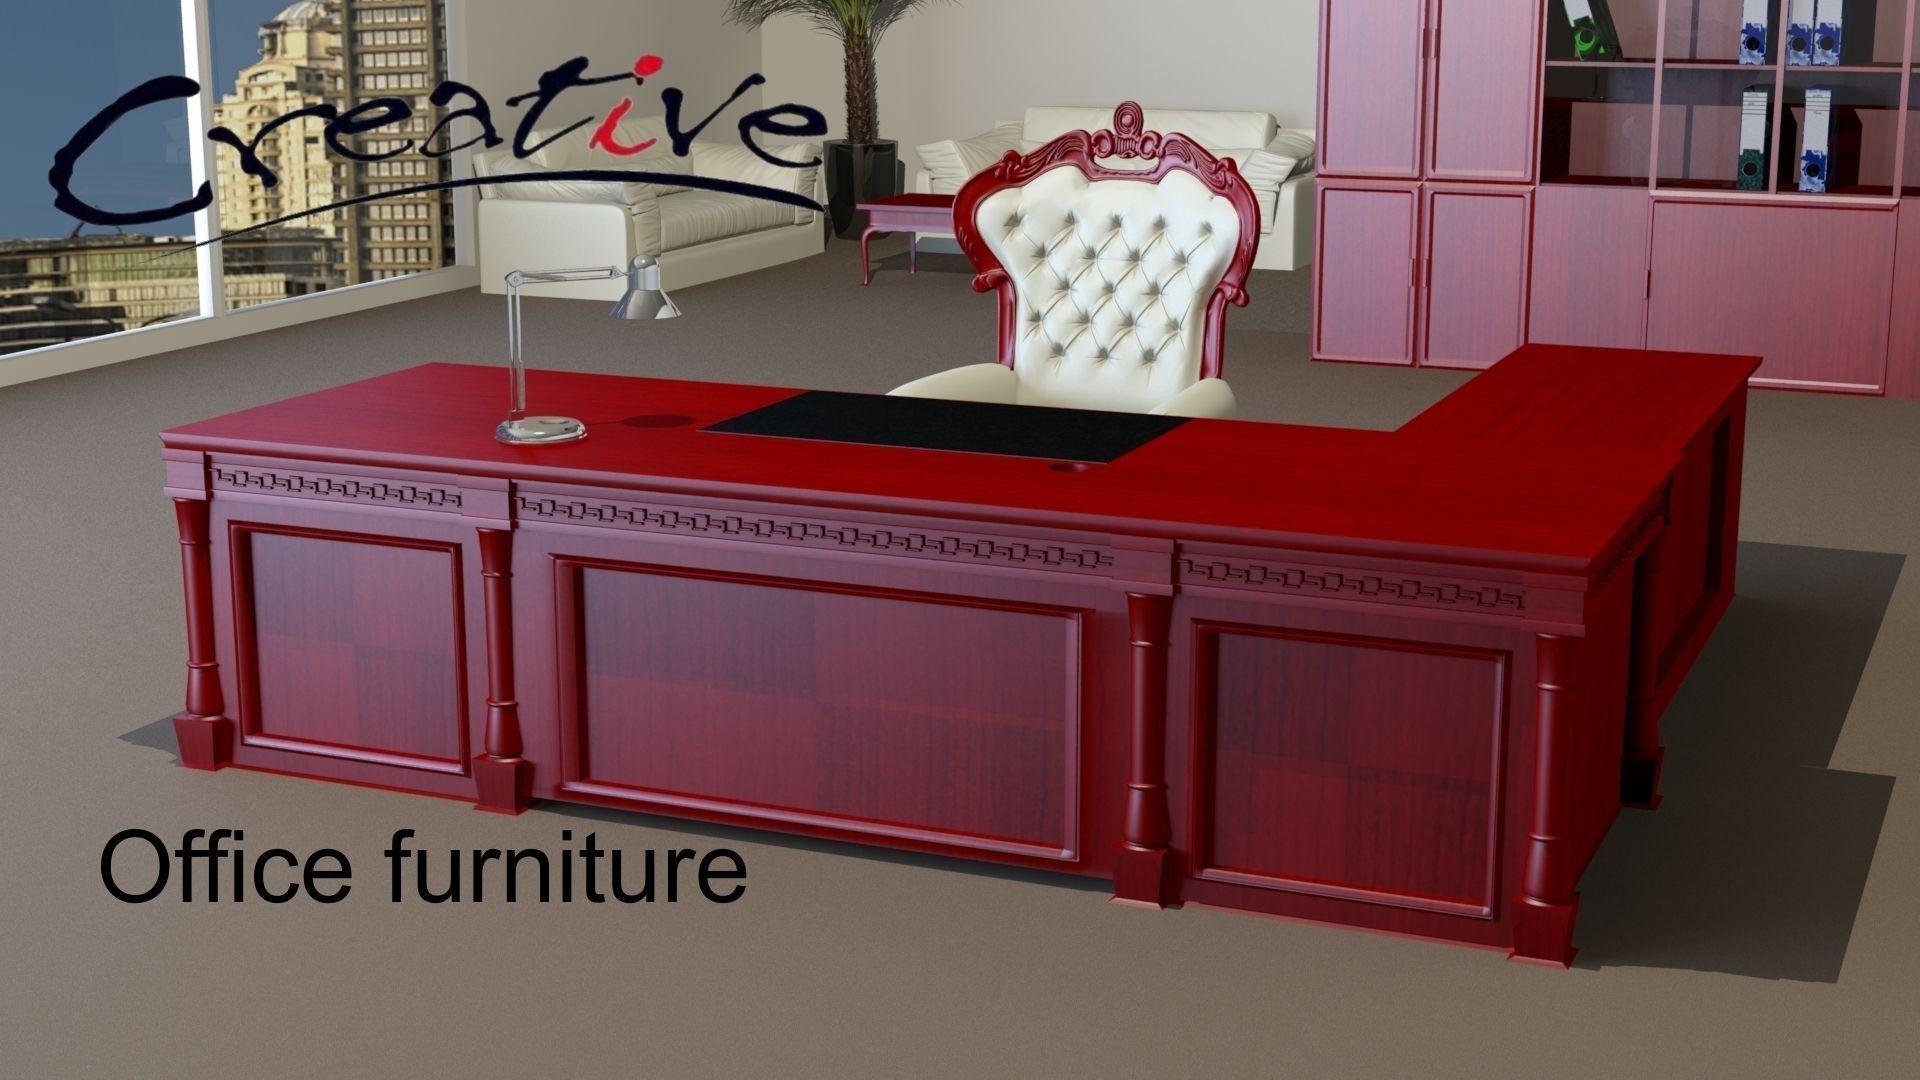 classic office desks. Classic Executive Veneer Desk With Office Furniture 3d Model Max Obj Mtl 8 Desks